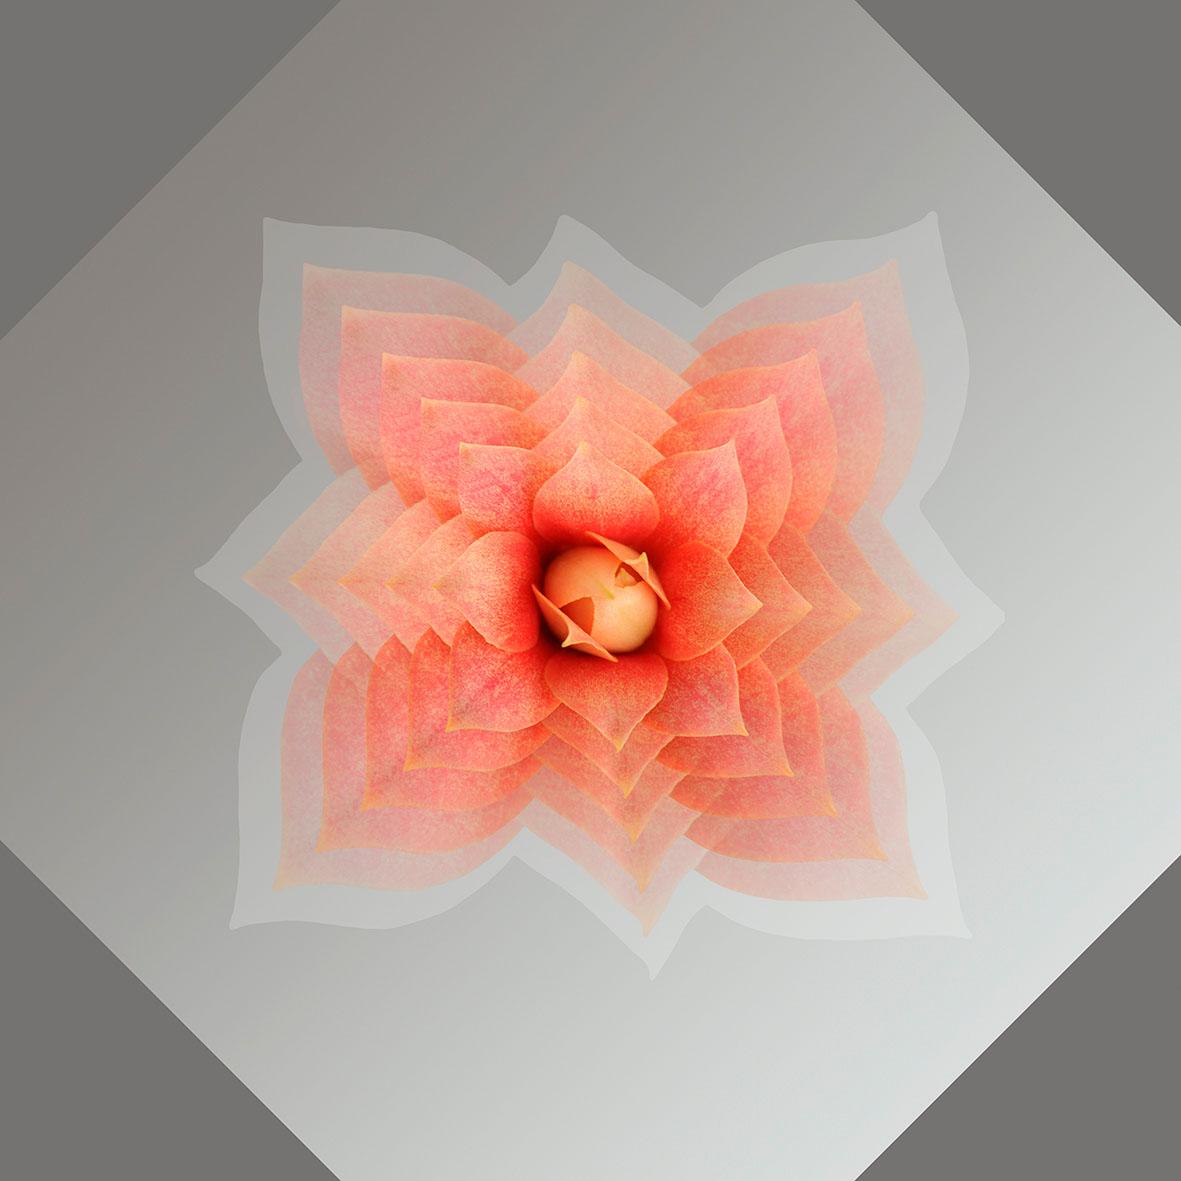 UNTITLED 4 series UNIVERSE, 2014 Pigment print, 50x50 сm